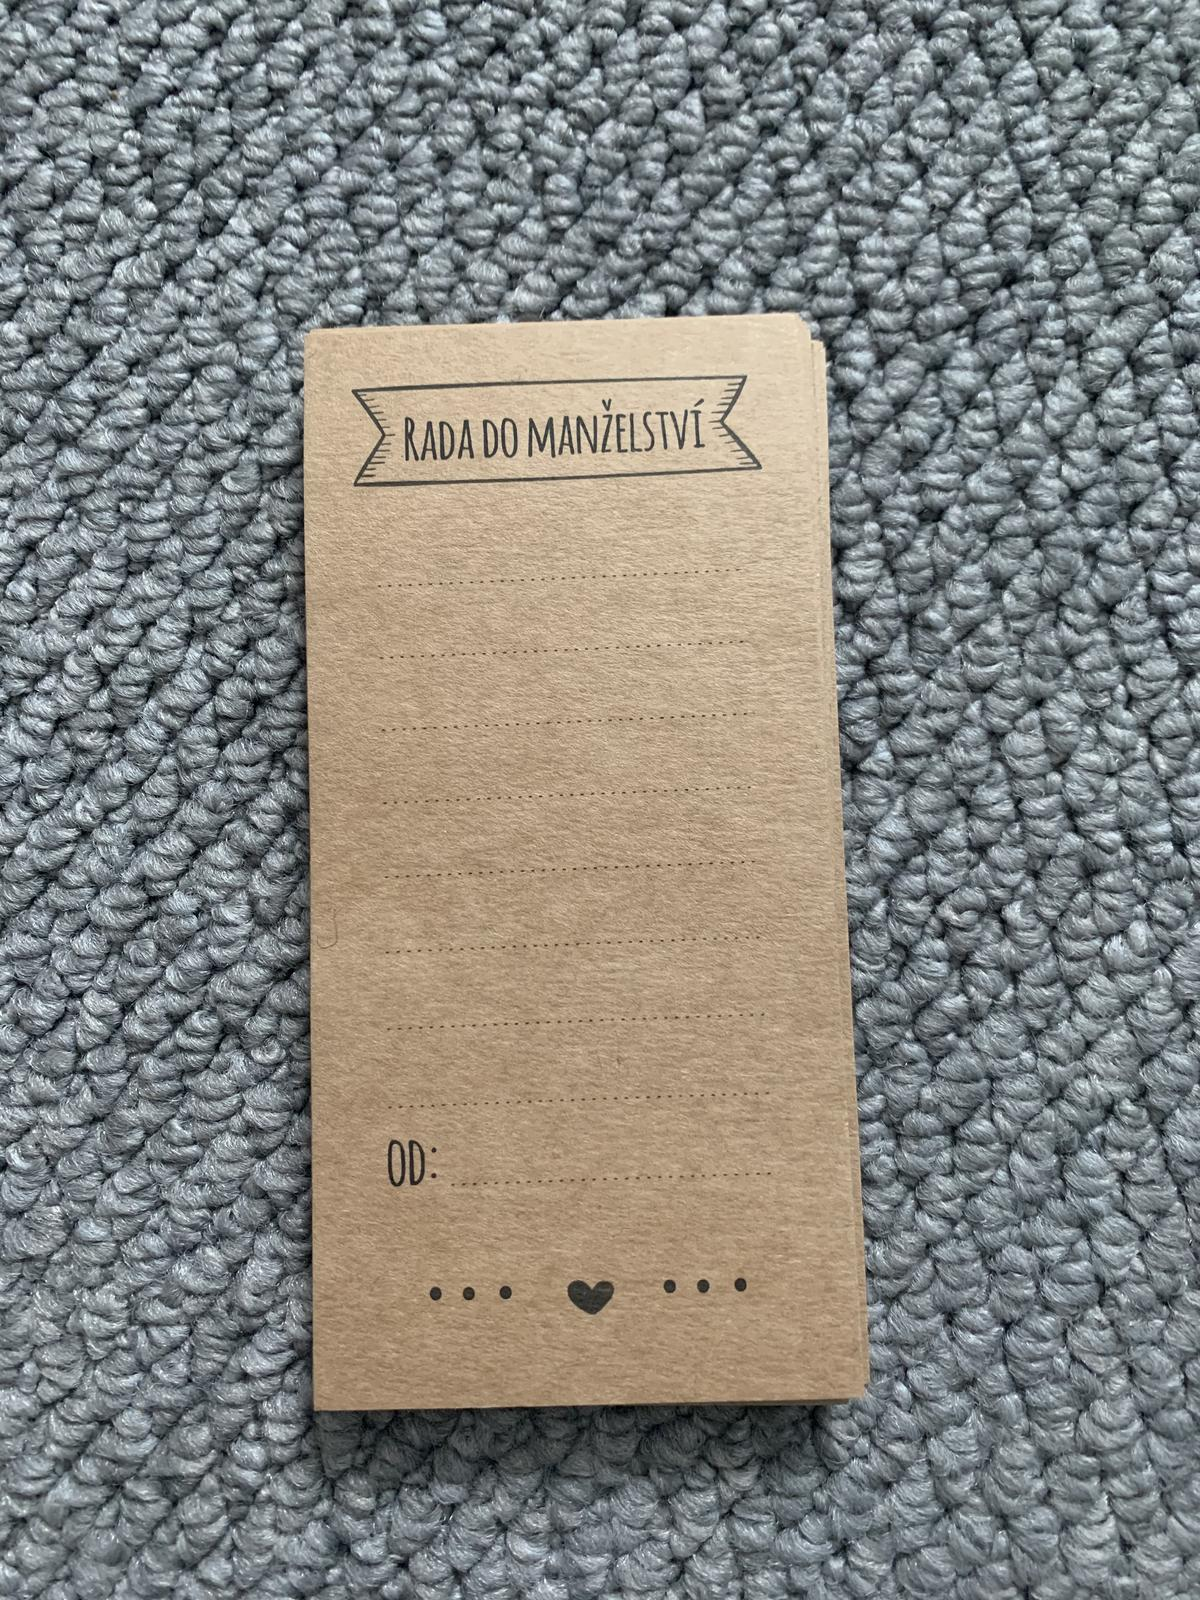 Rady manželům - kraftové kartičky - Obrázek č. 1